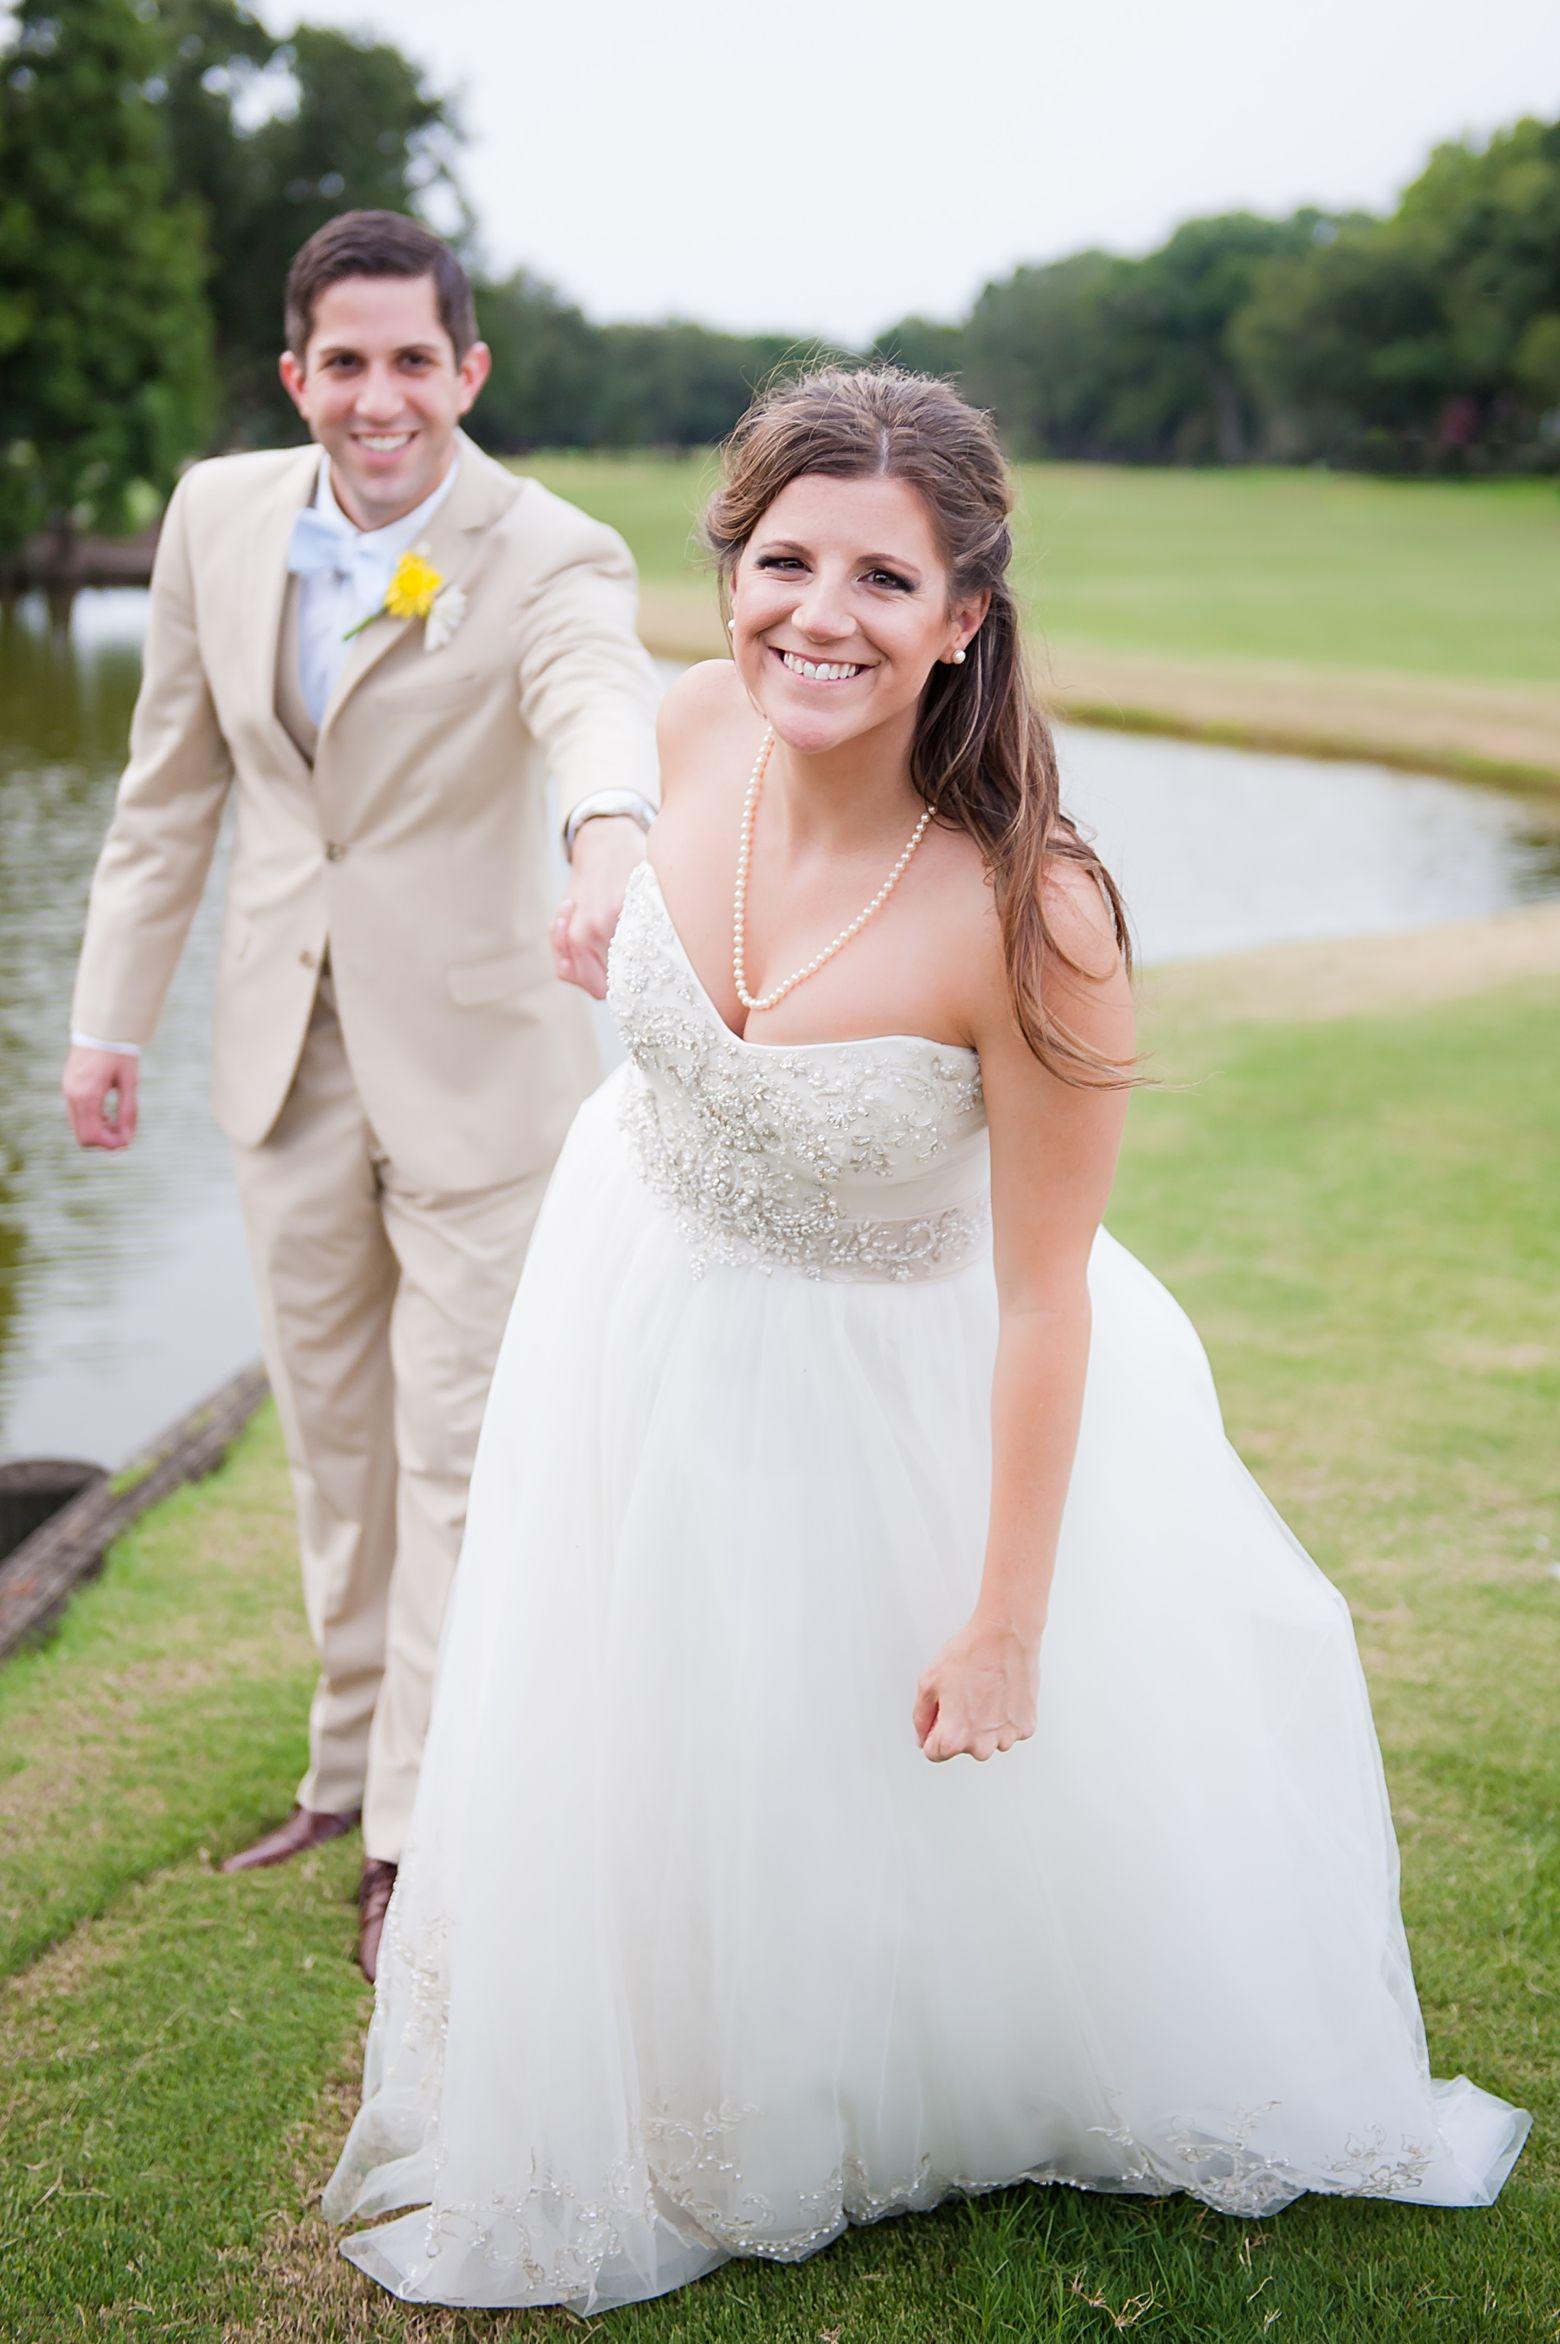 Wedding dresses lakeland fl  Classic Palma Ceia Country Club Wedding in Tampa Florida Captured